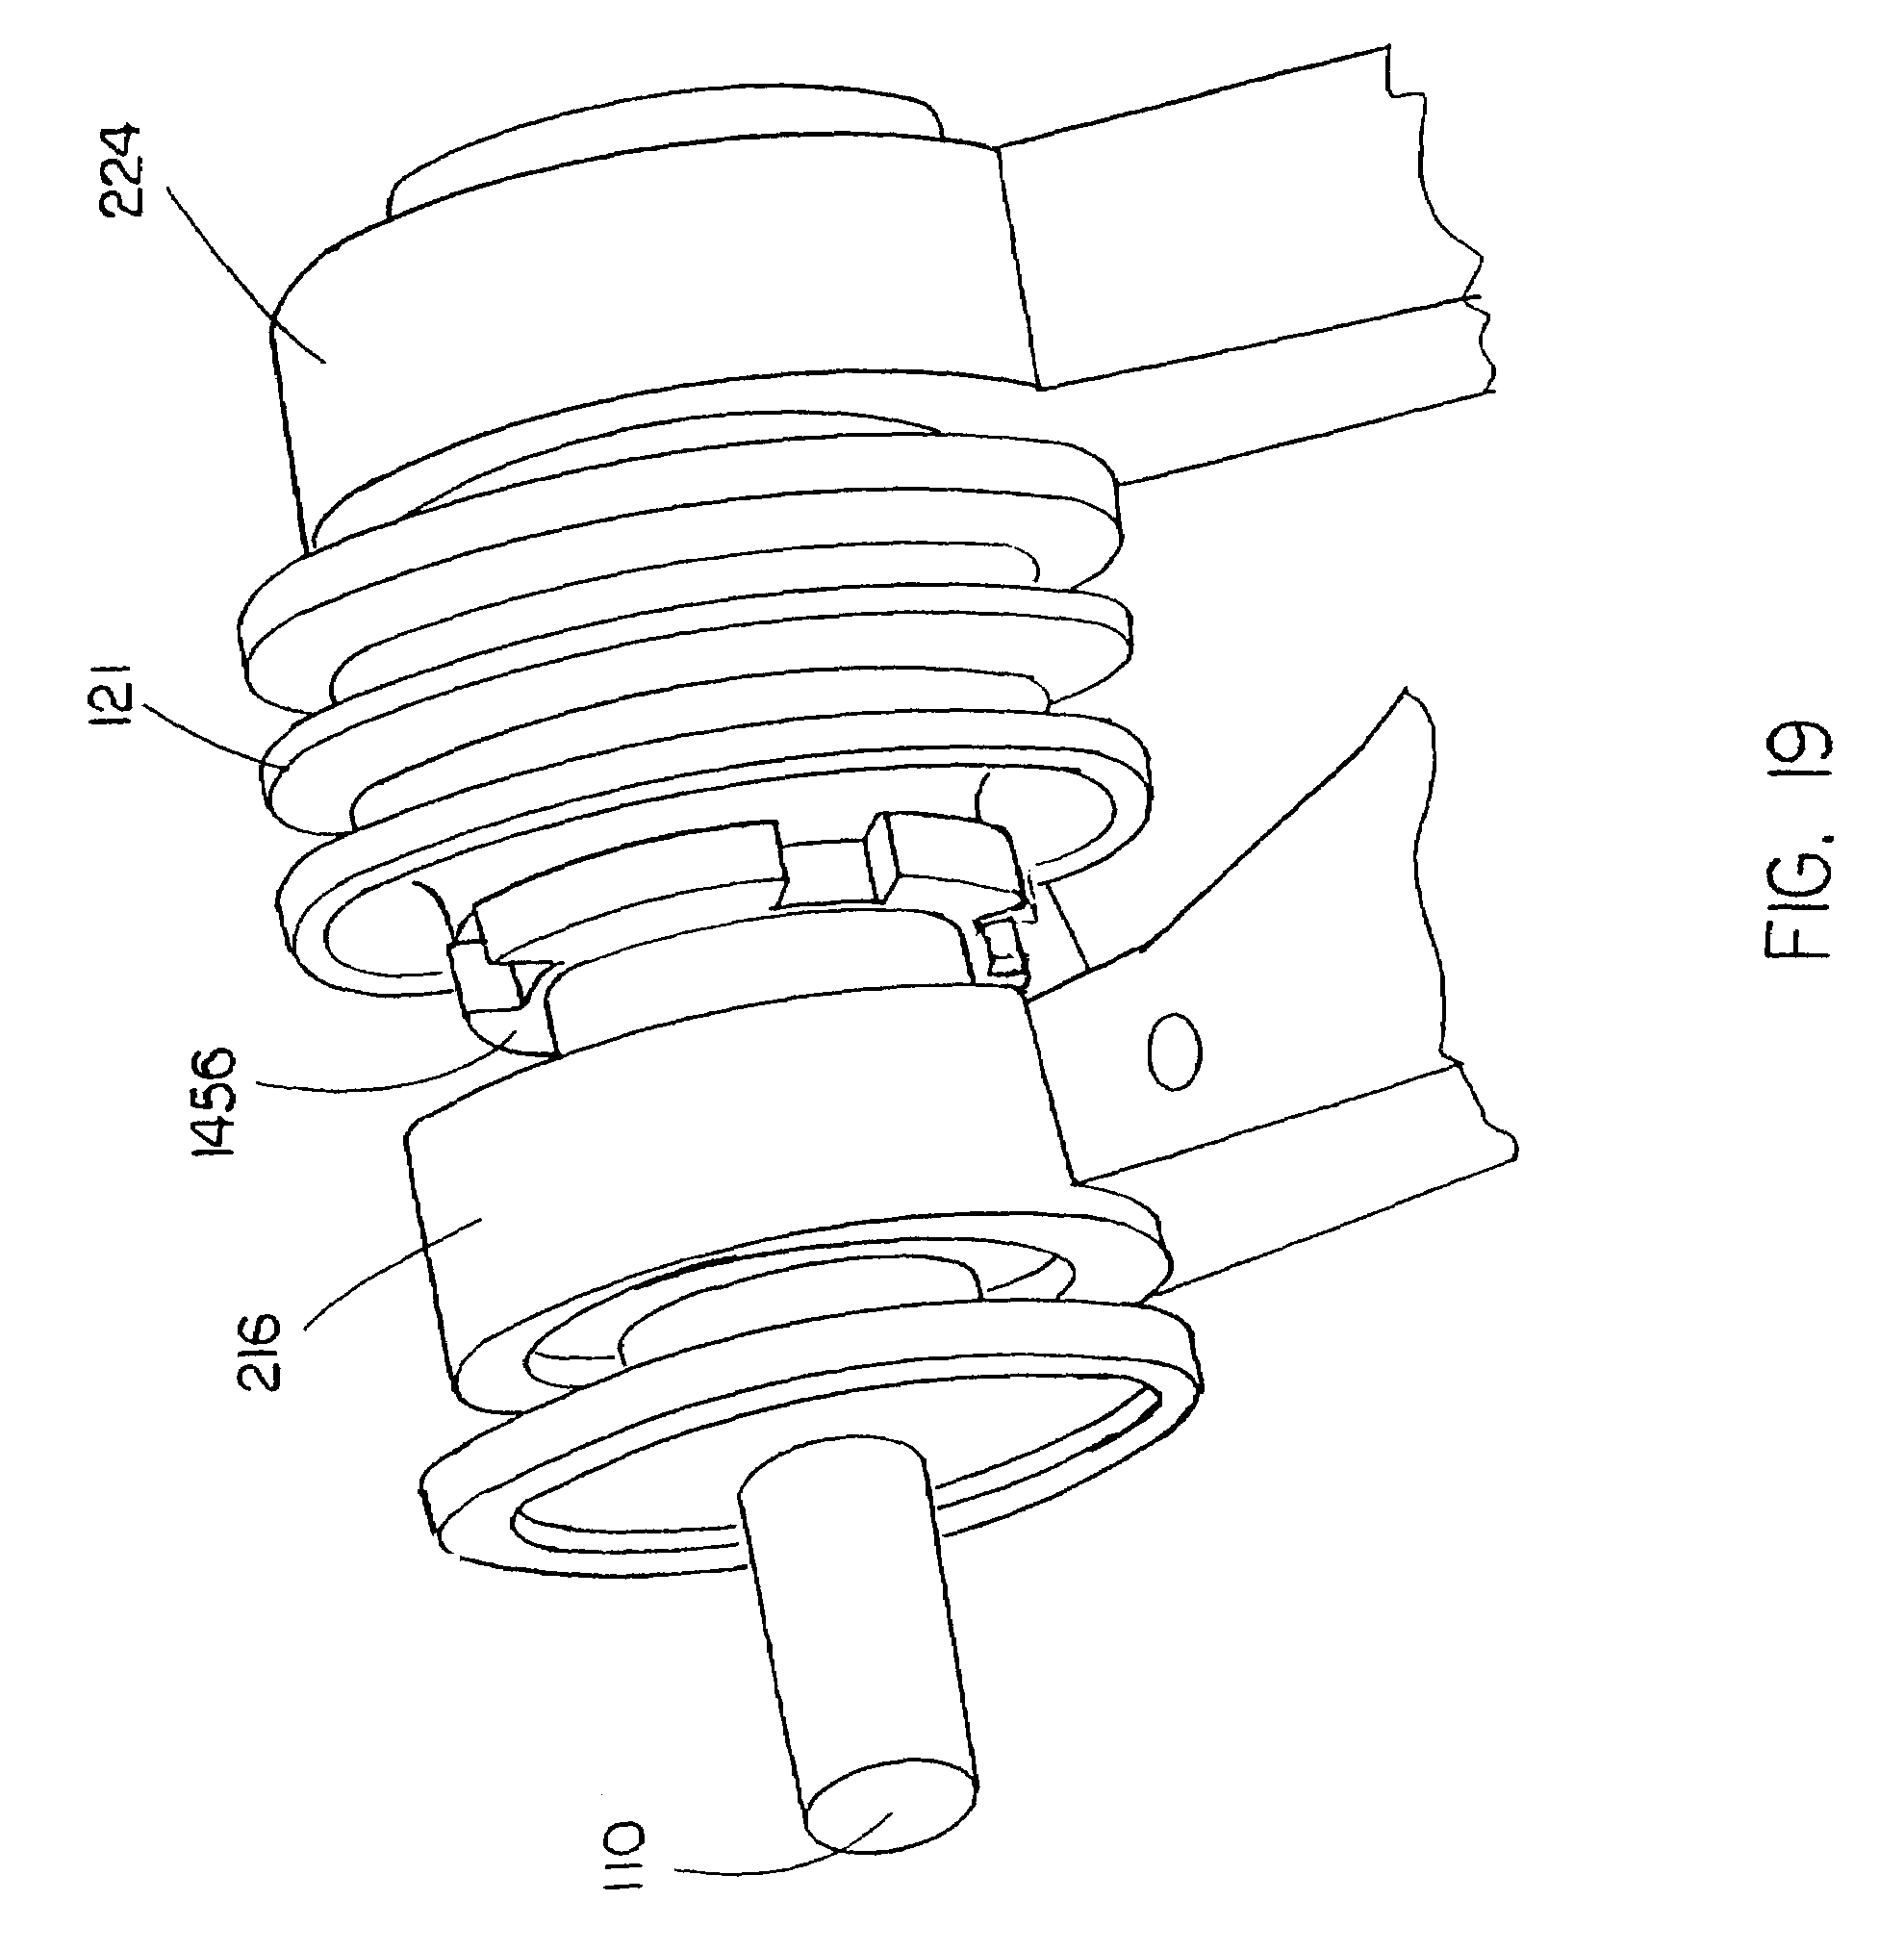 Scintillating overhead valve engine diagram 530 327120 gallery us07137327 20061121 d00036 overhead valve engine diagram 530